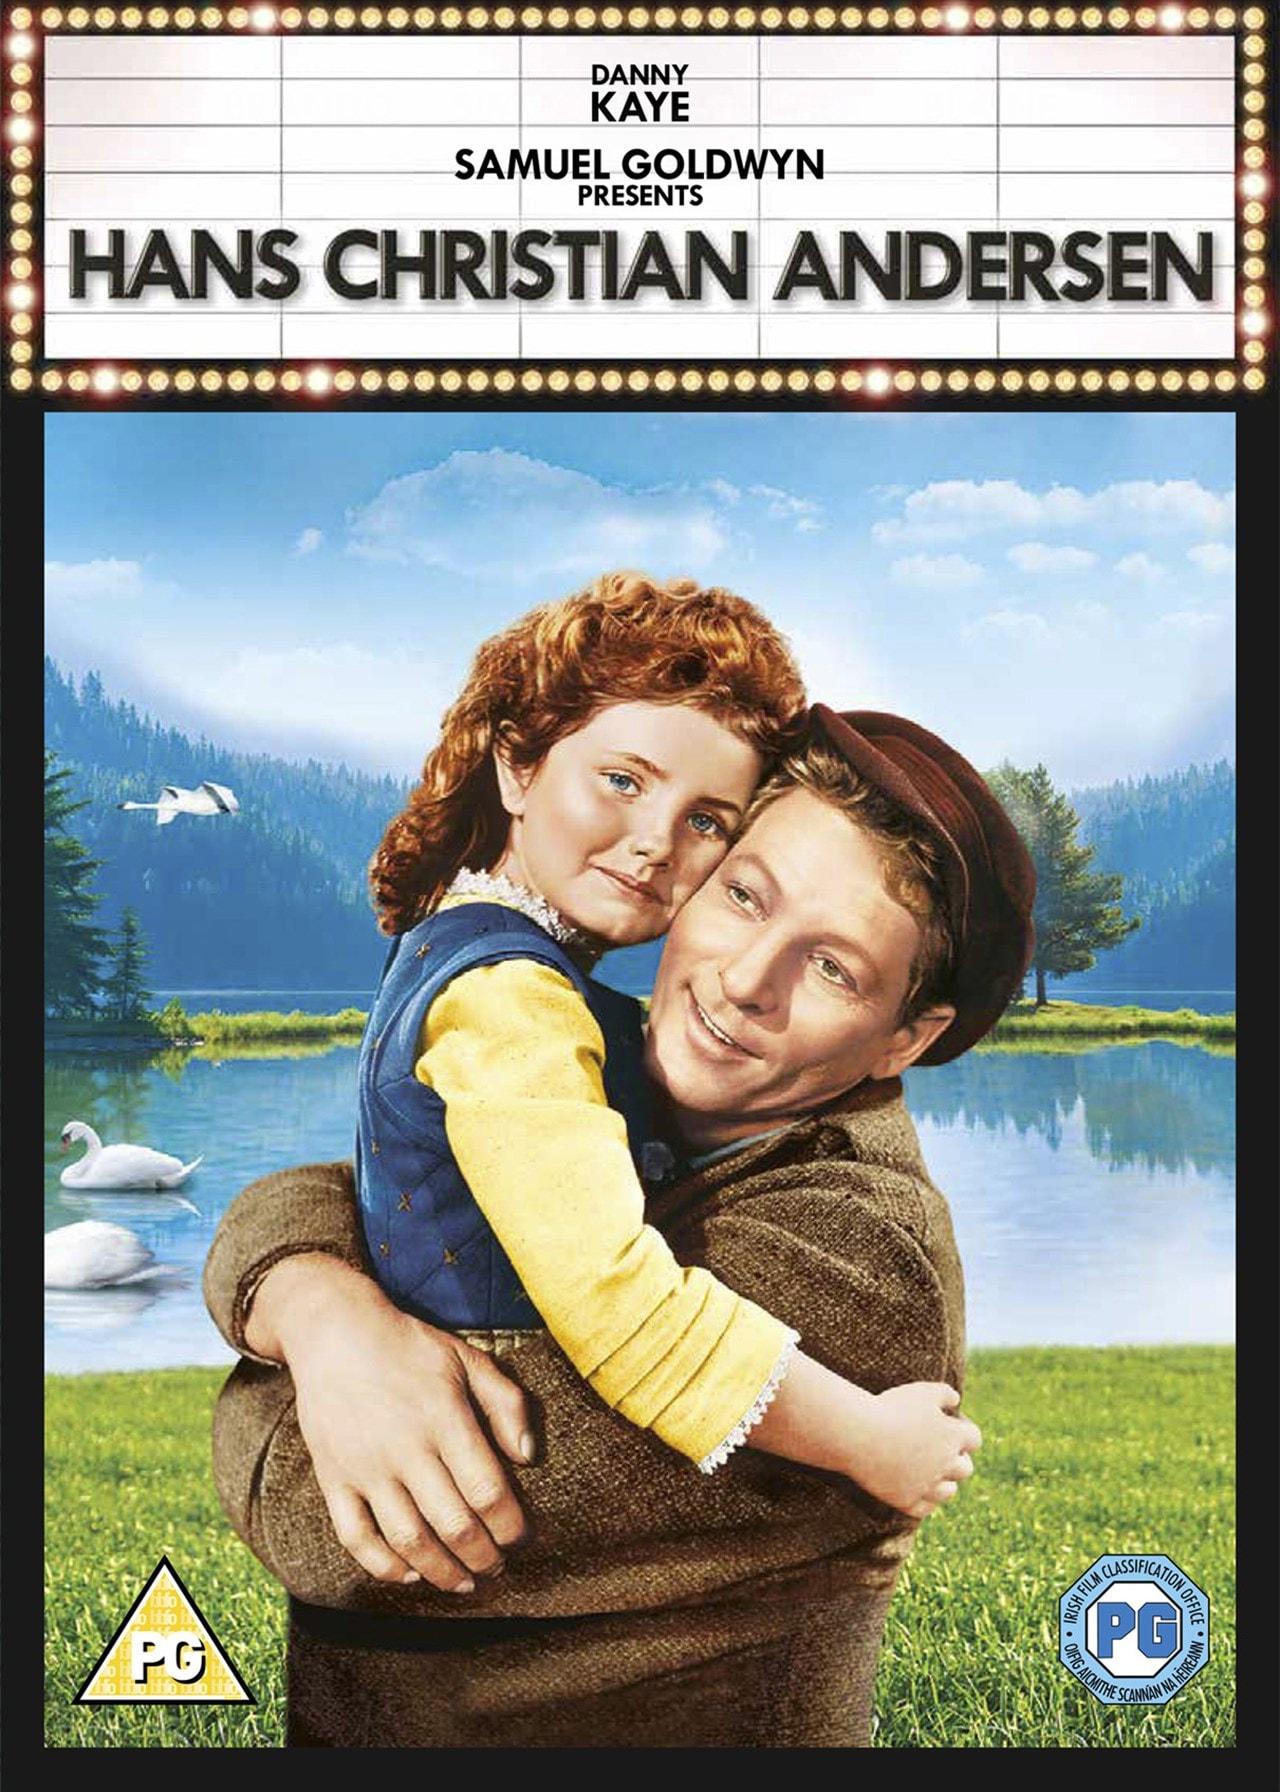 Hans Christian Andersen - Samuel Goldwyn Presents - 3